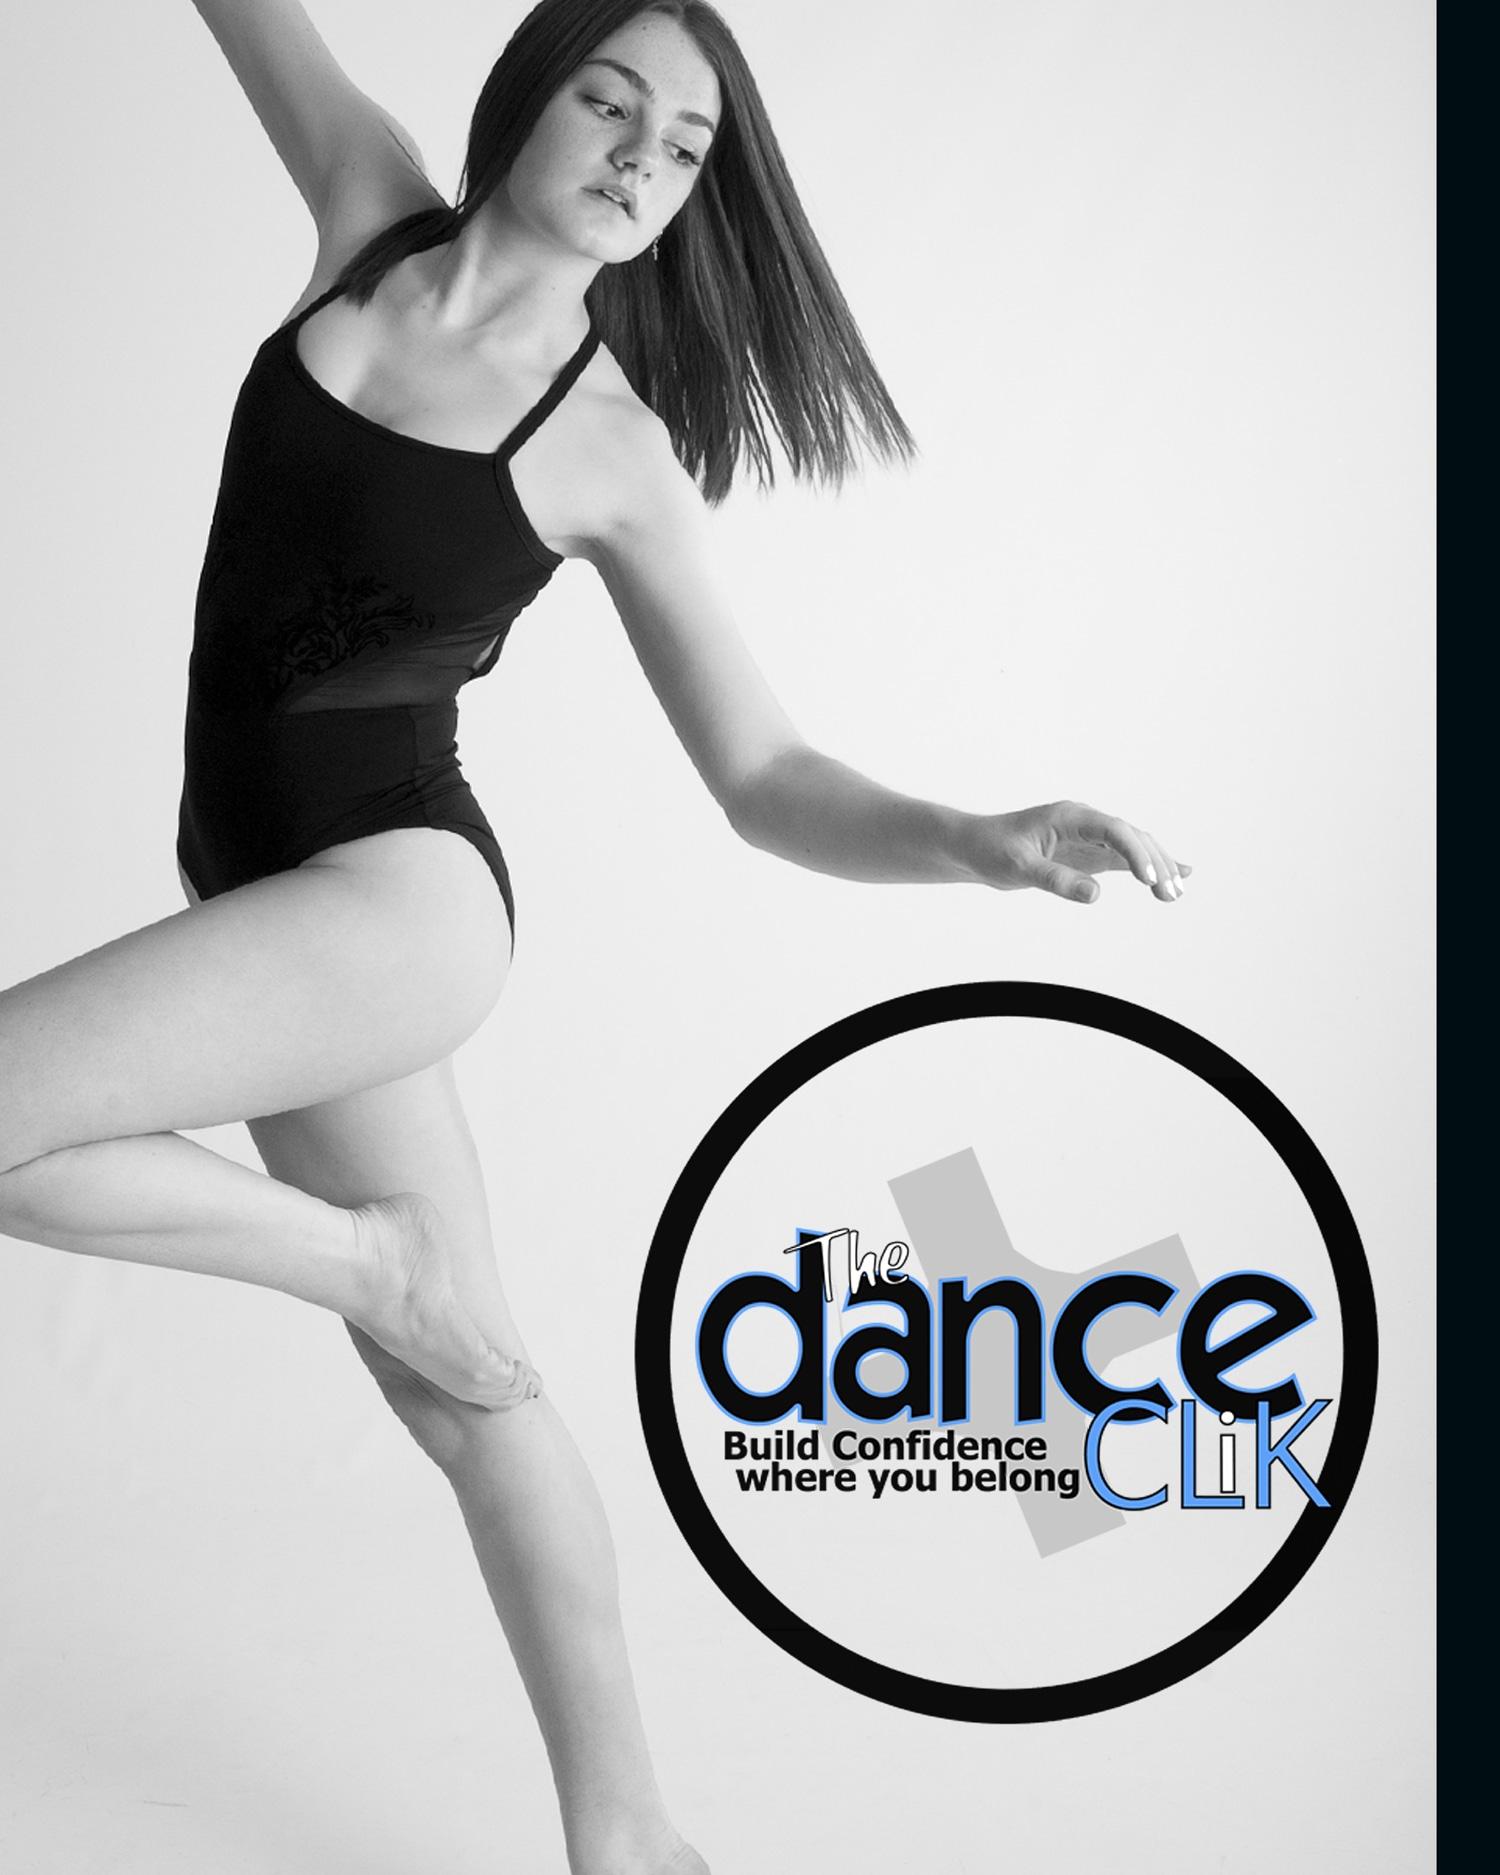 The Dance CLIK